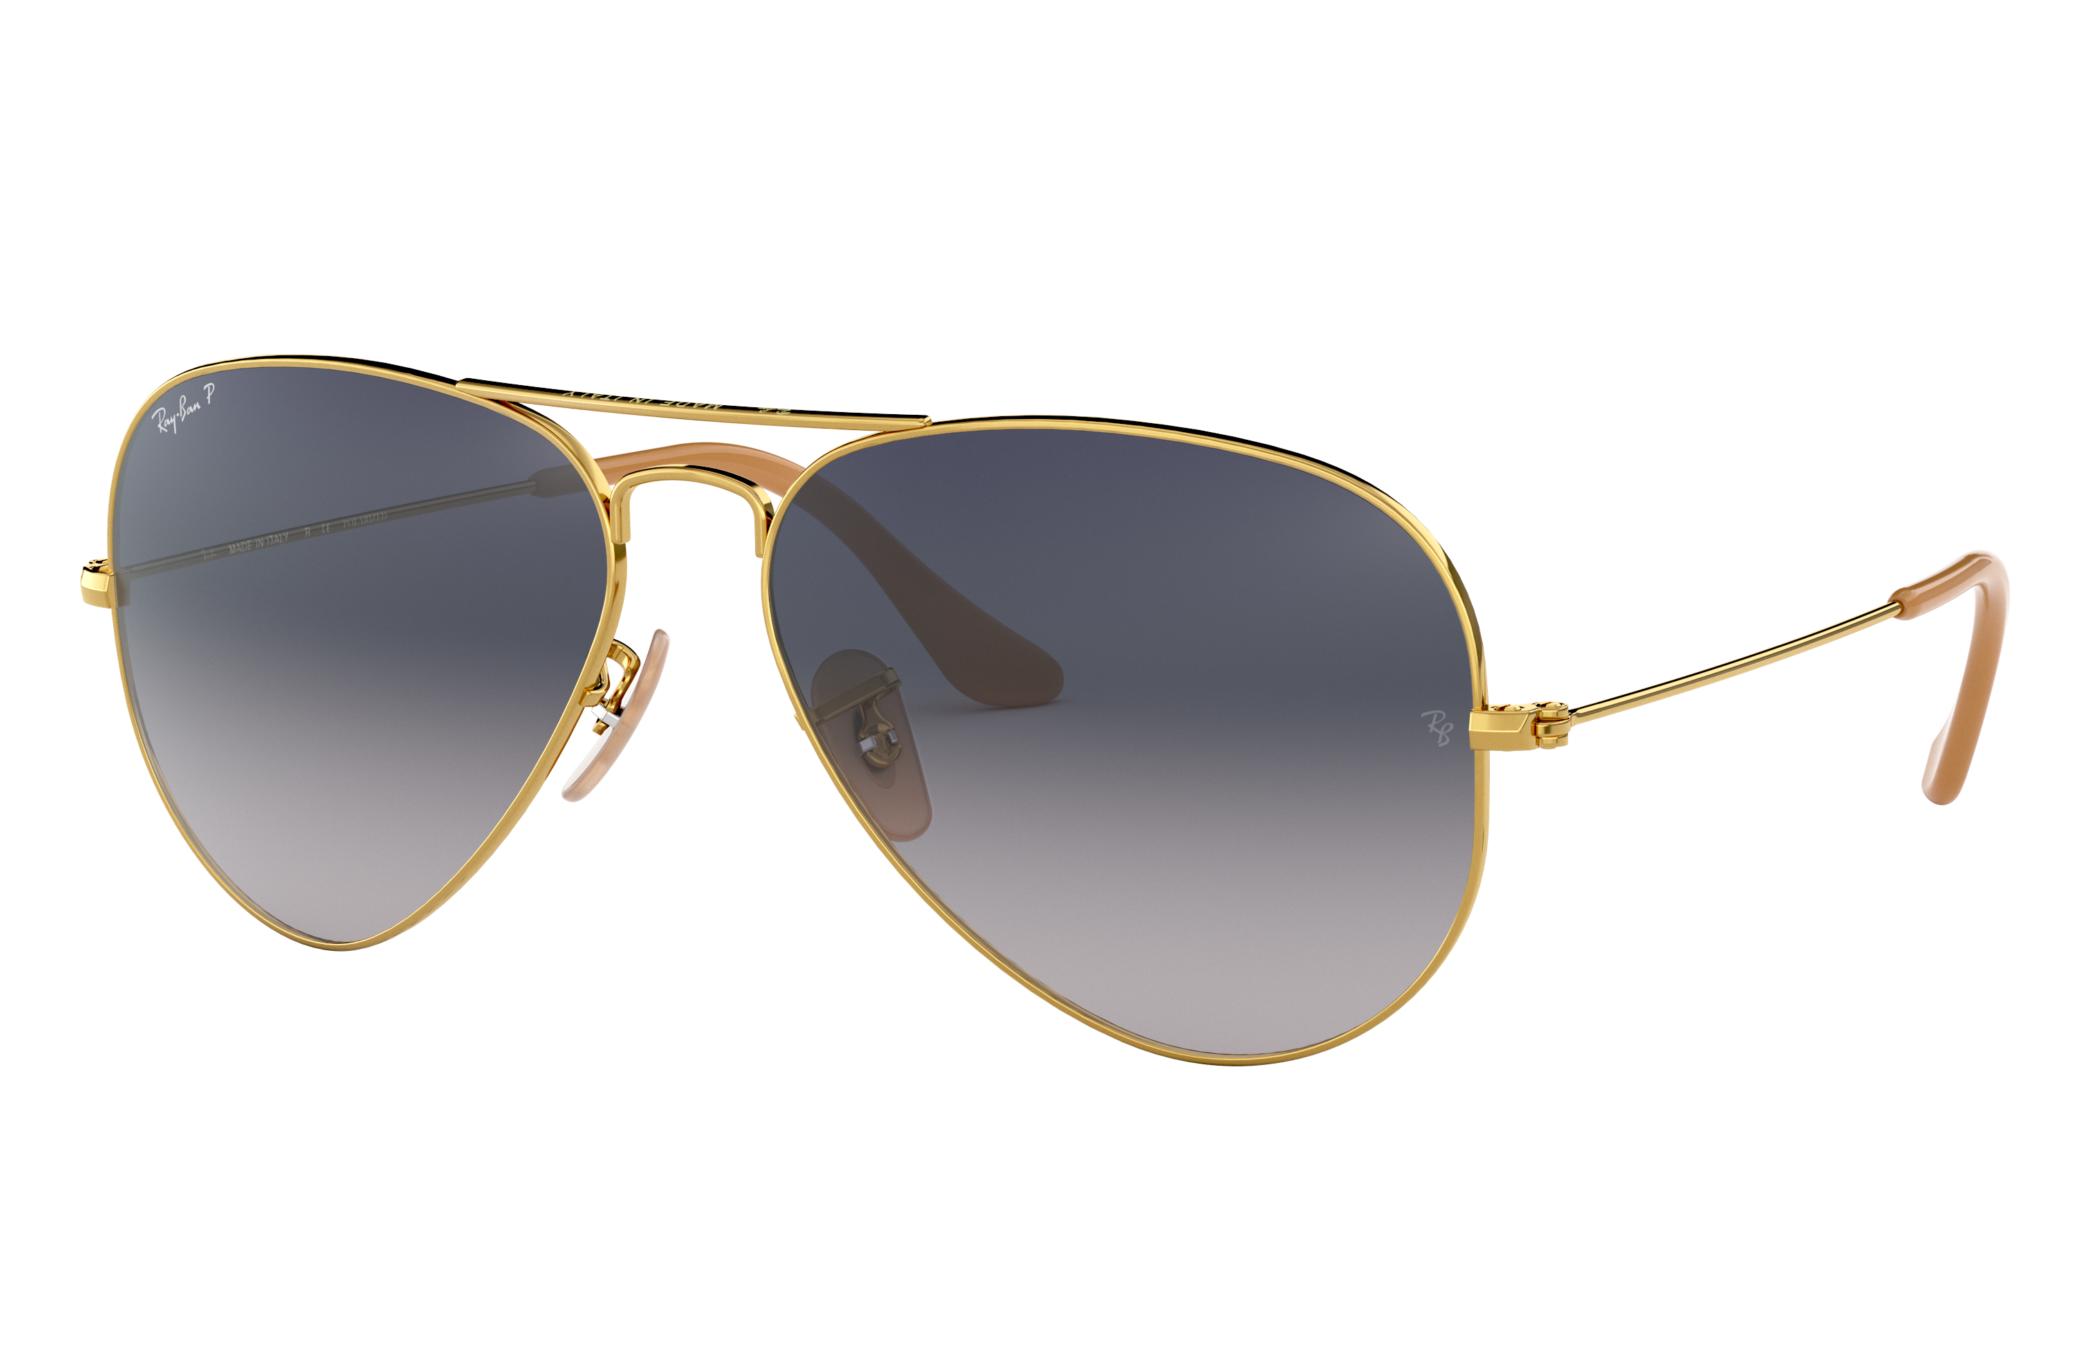 Ray-Ban Aviator Gradient Gold, Polarized Blue Lenses - RB3025